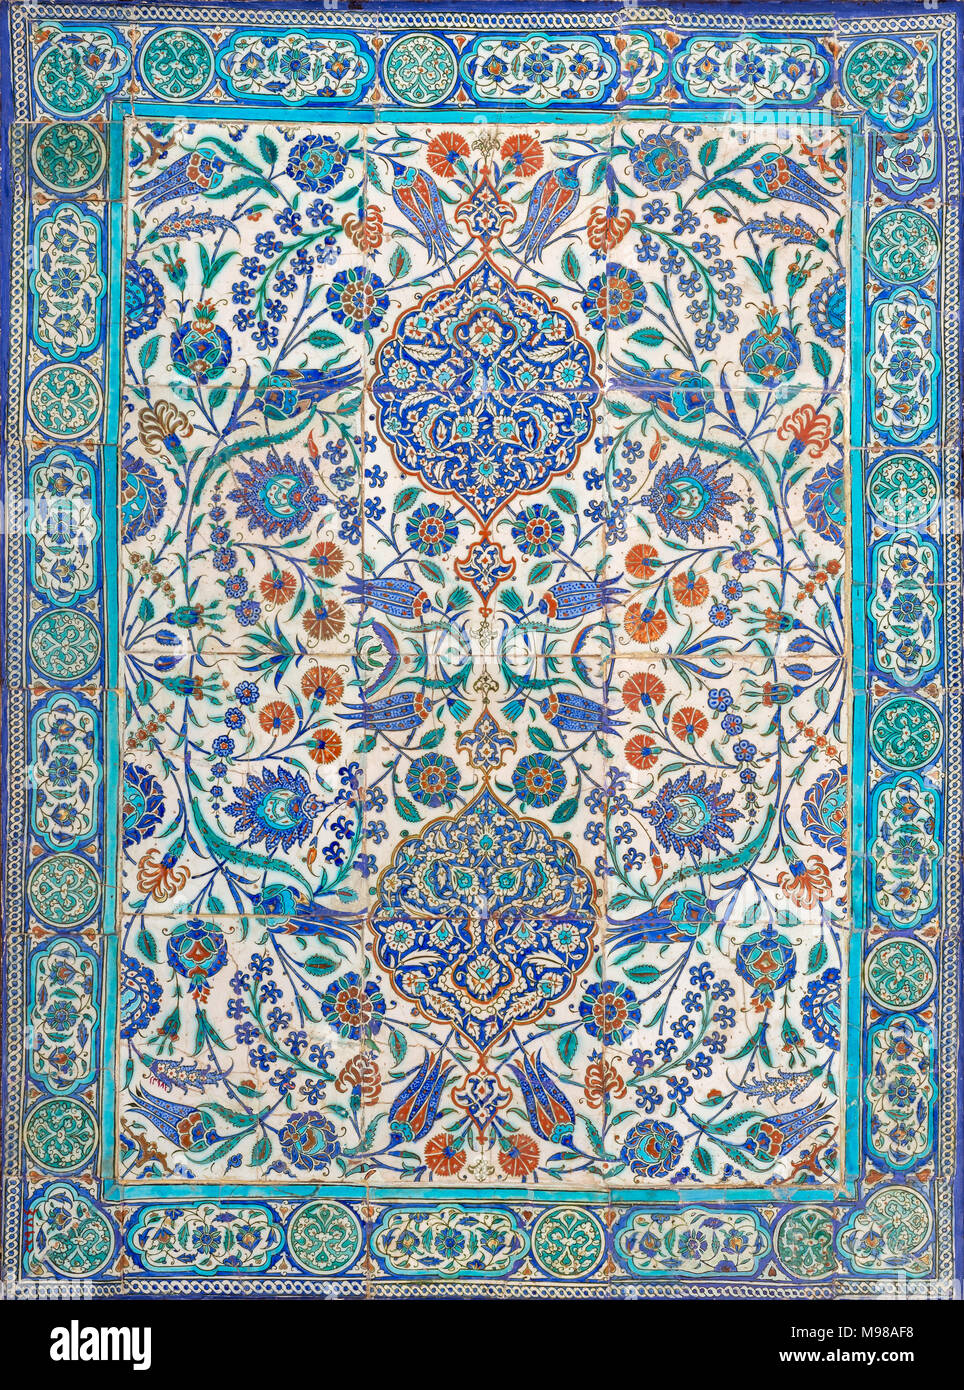 Ottoman Era Style Glazed Ceramic Tiles From Iznik Turkey Decorated